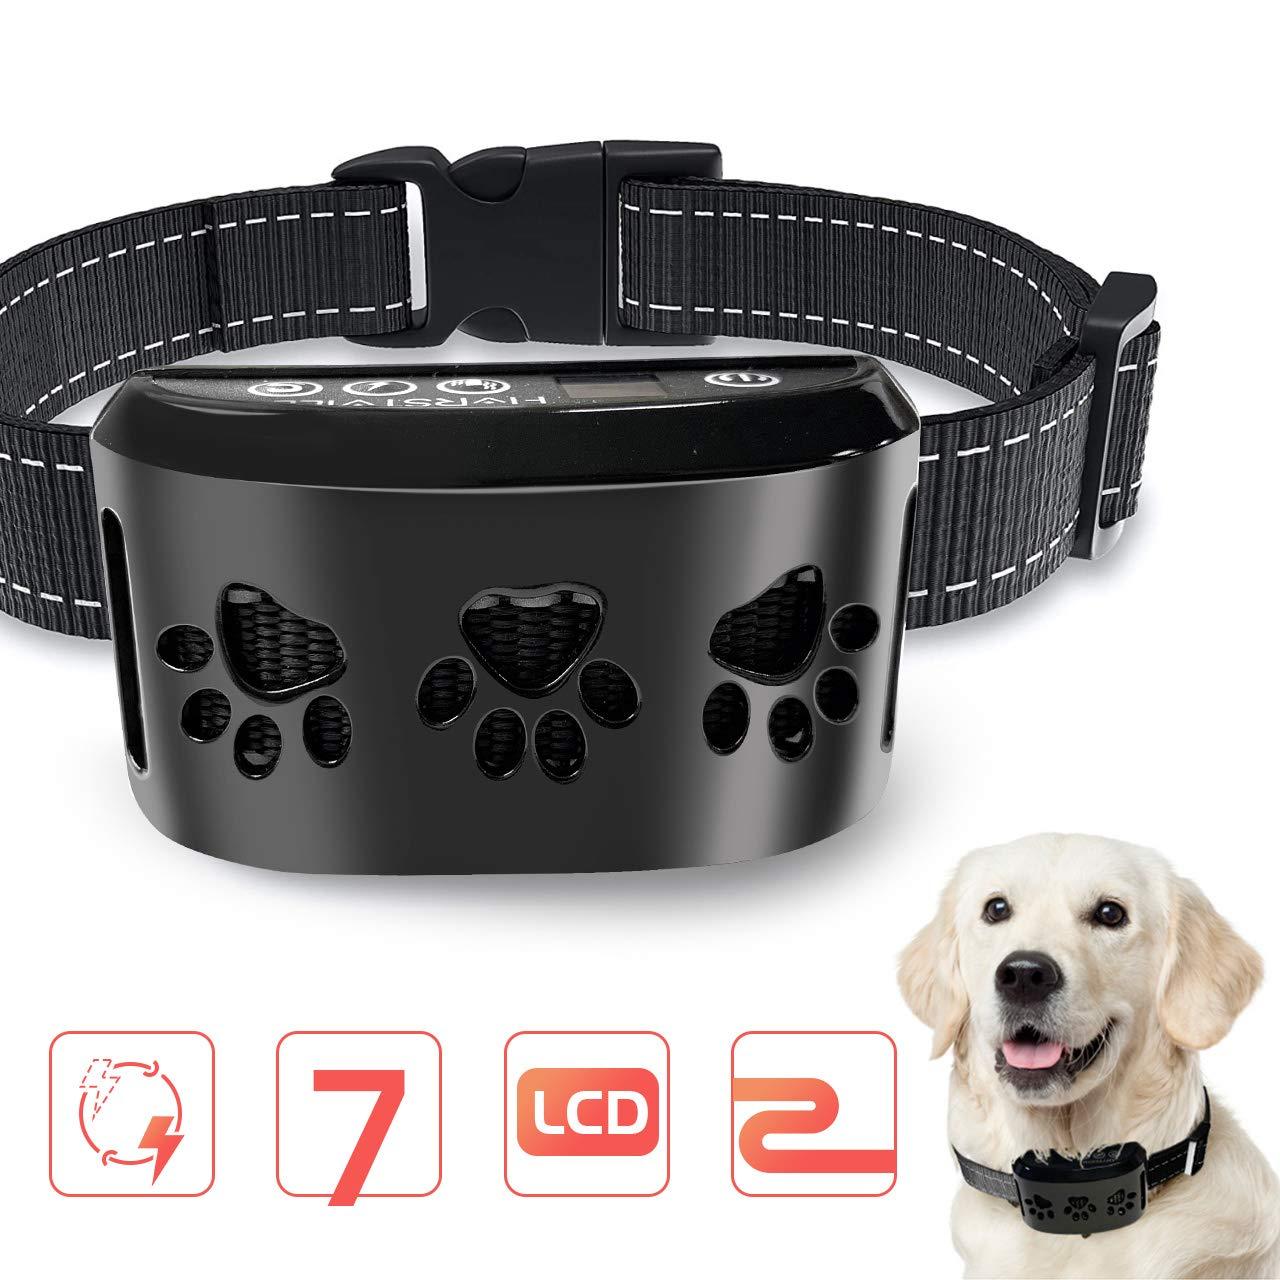 HVRSTVILL Advanced Dog Bark Collar for Small Medium Large Dog with Beep Vibration and Harmless Shock Rechargeable Anti Bark Training Collar Safely and Humane Dog Shock Collar Adjustable Belt